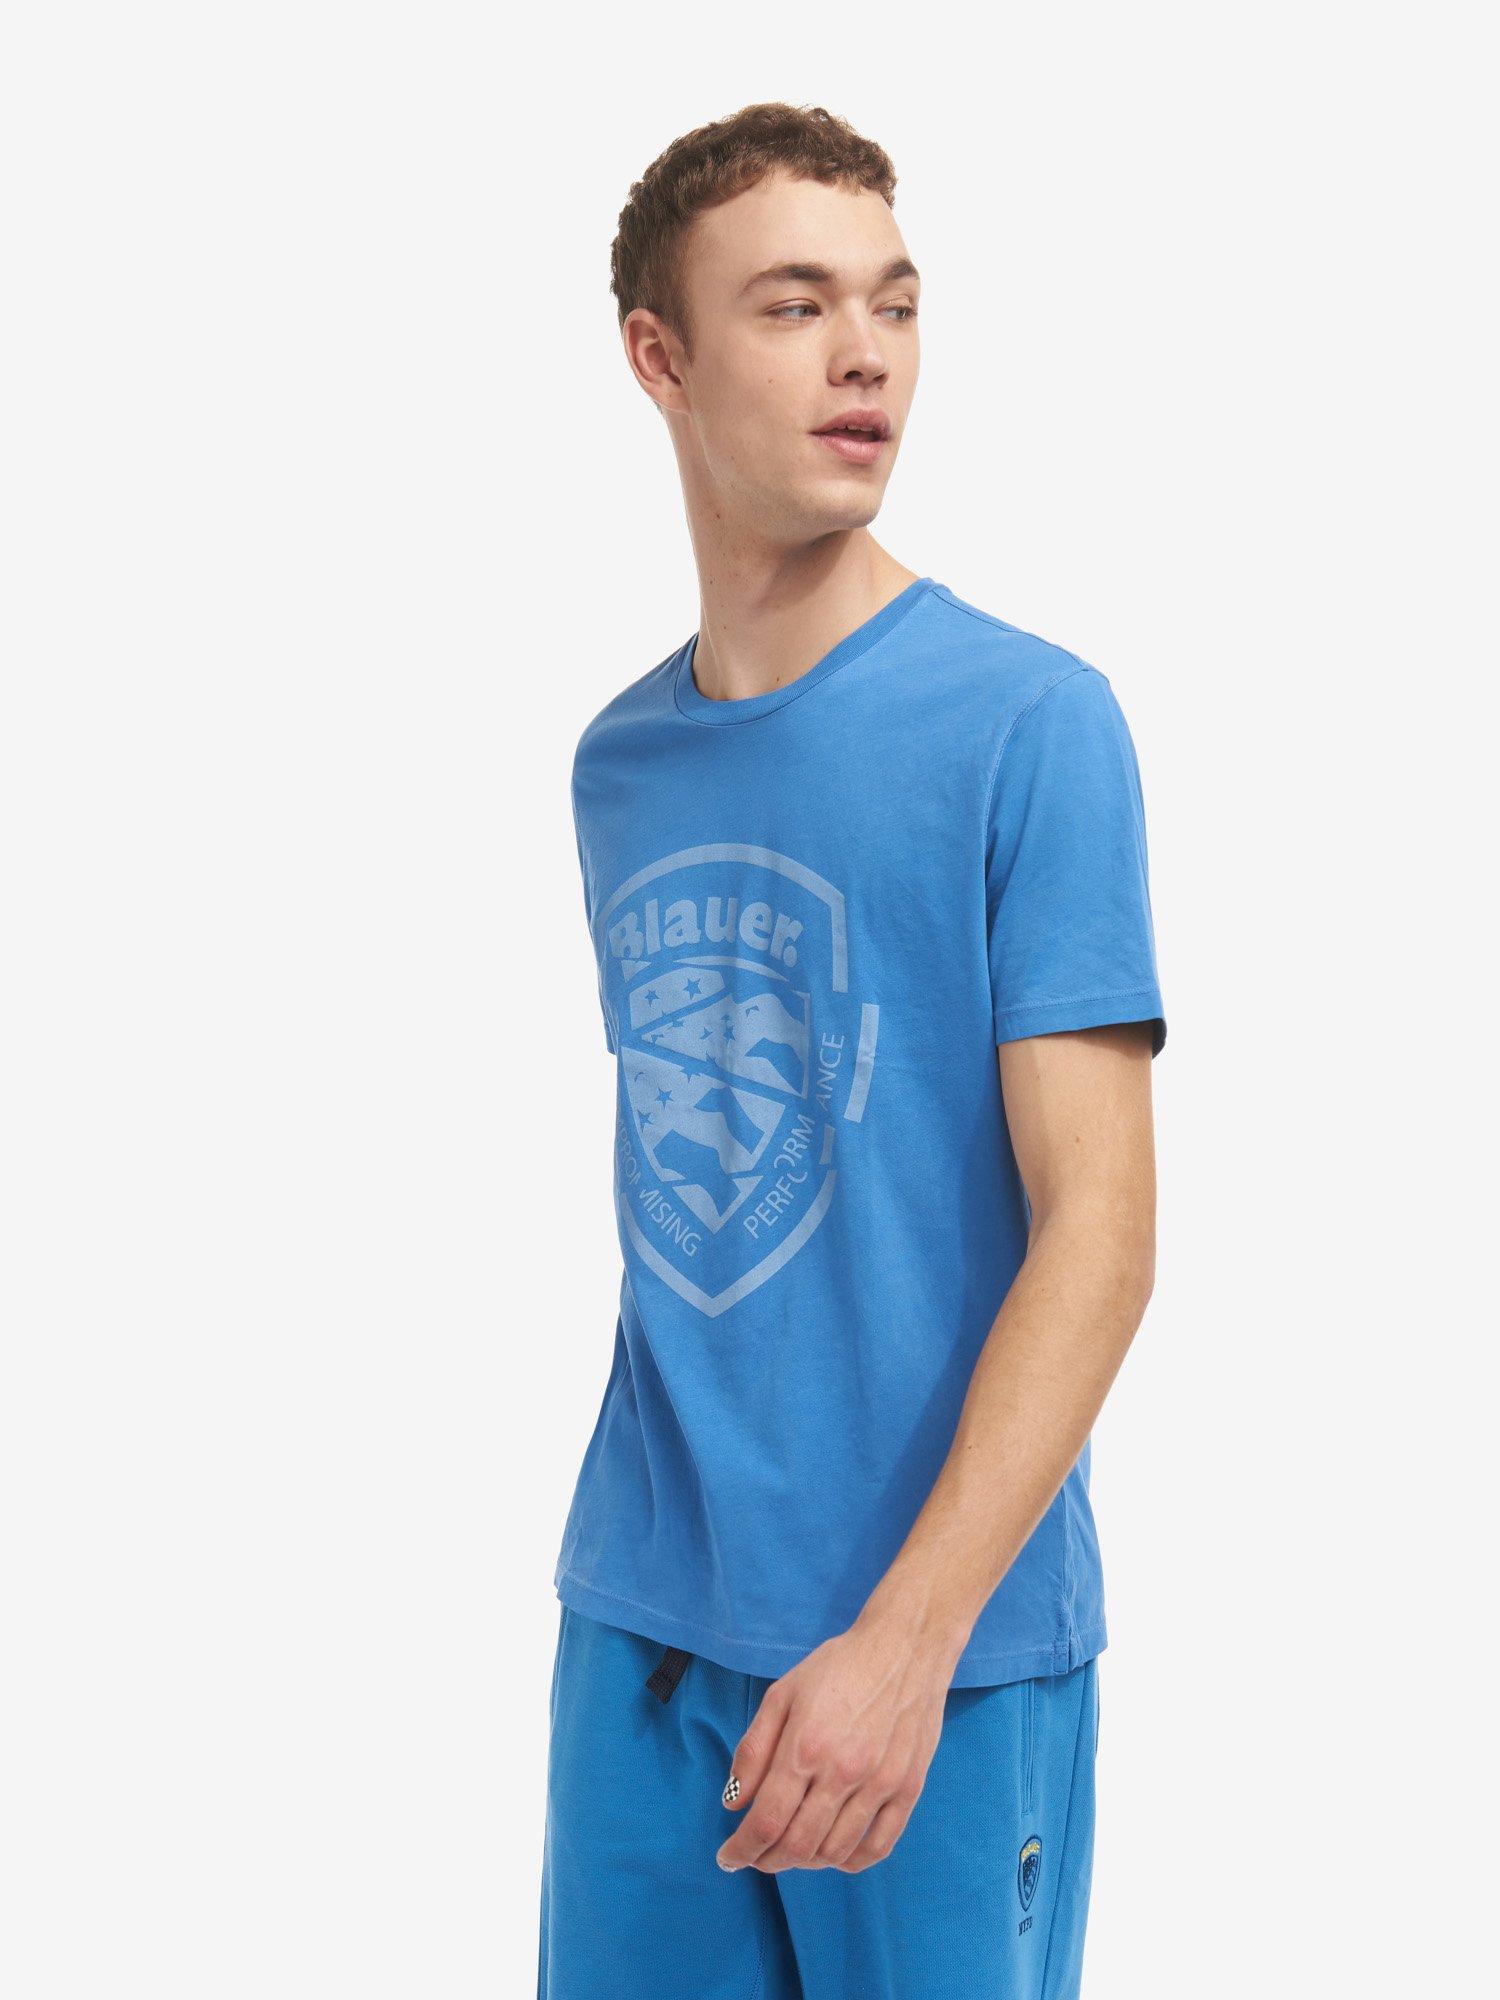 Blauer - T-SHIRT ZERSCHNITTENER SCHILD - Light Sapphire Blue - Blauer